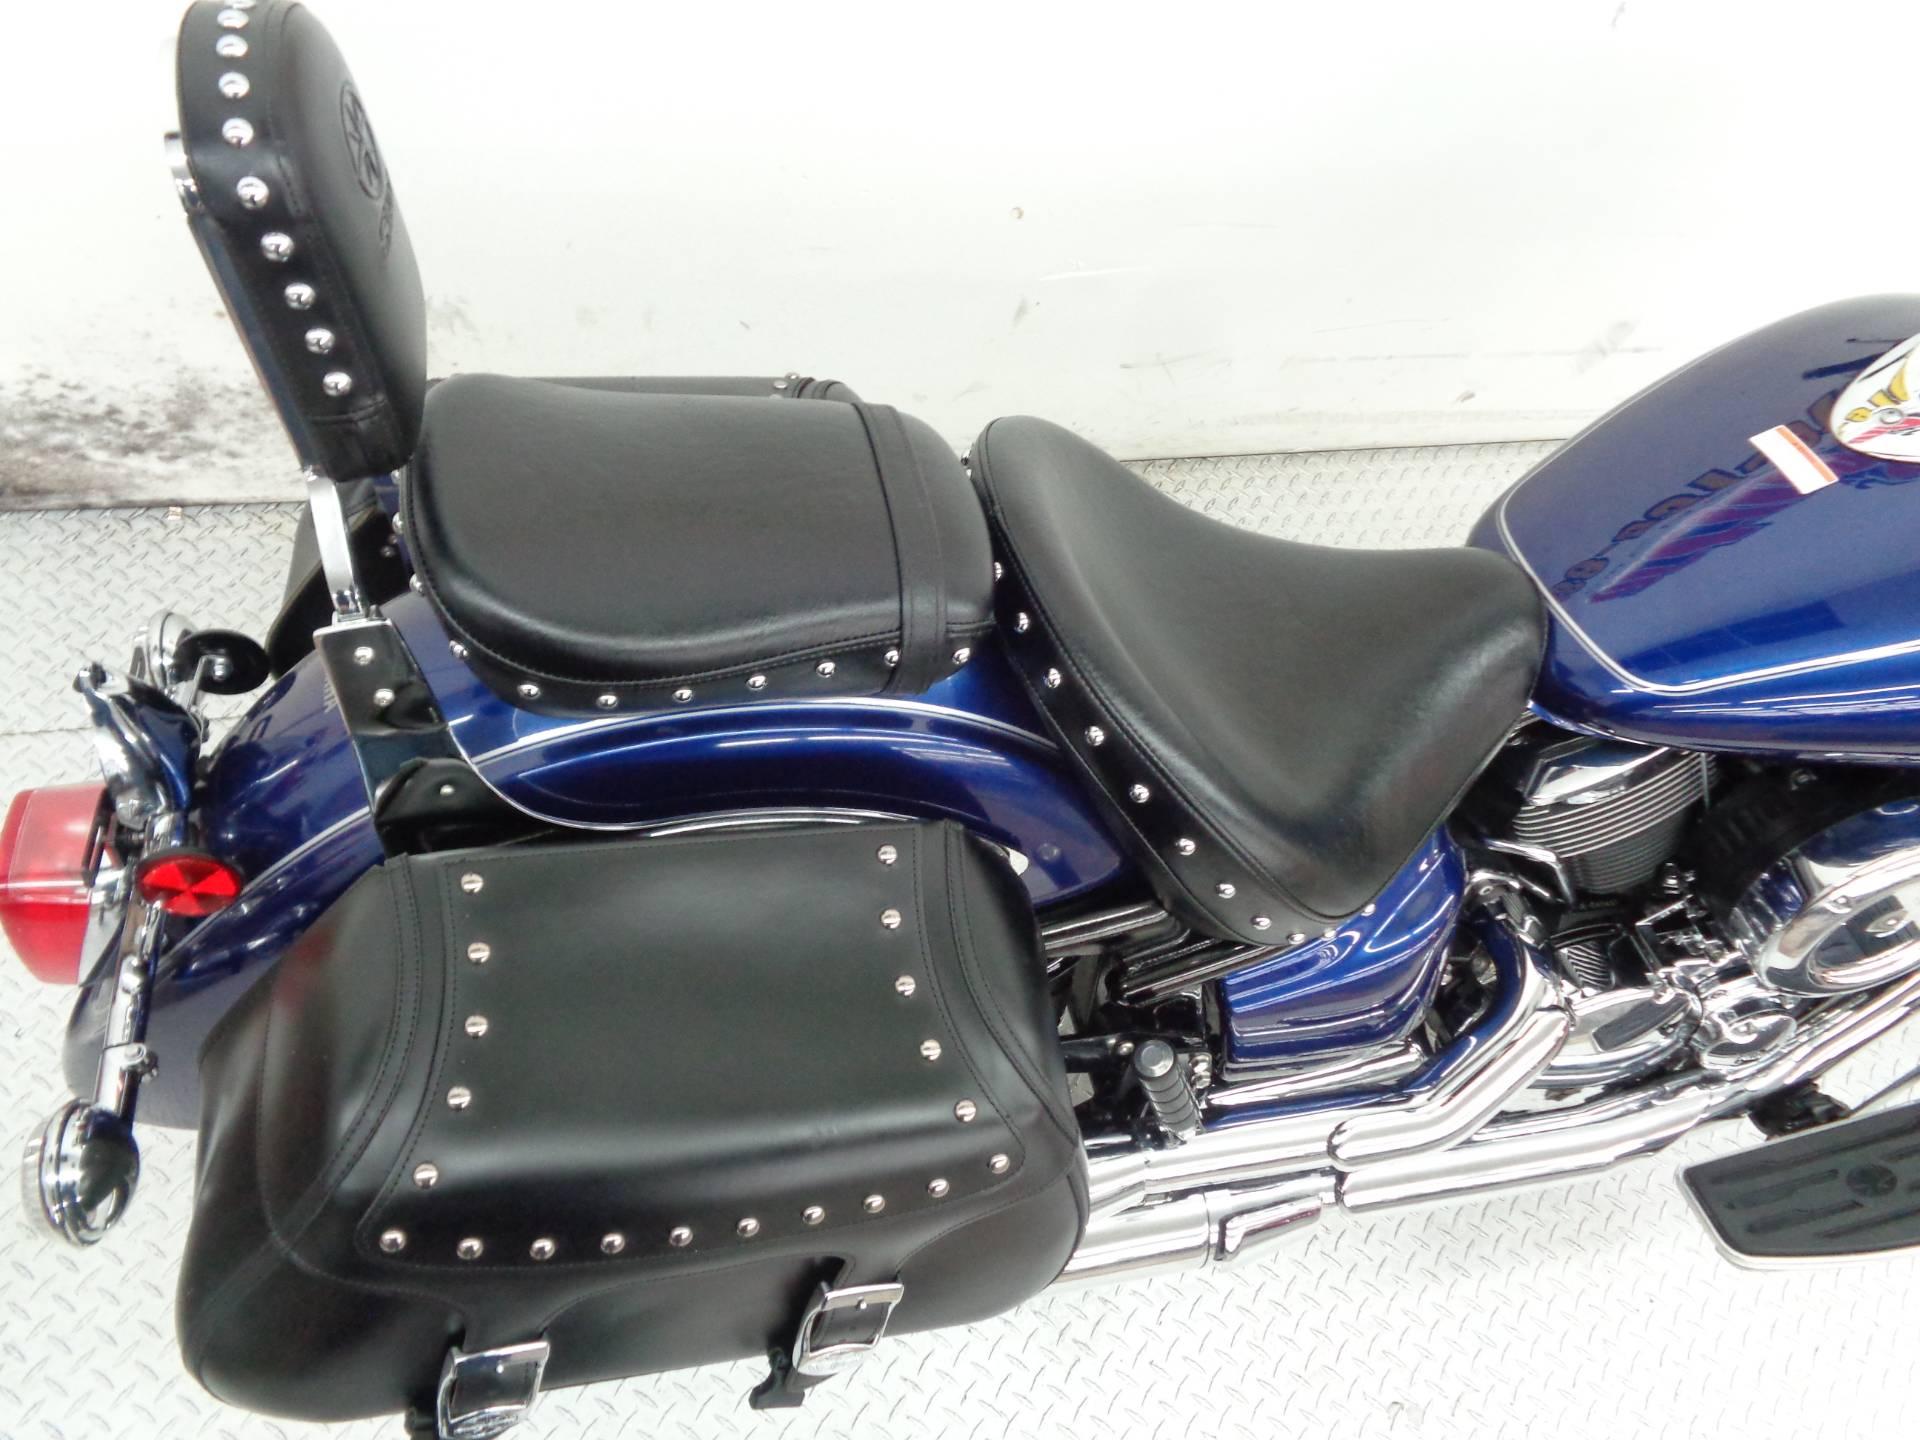 Used 2009 Yamaha V Star 1100 Silverado Motorcycles in Tulsa, OK ...